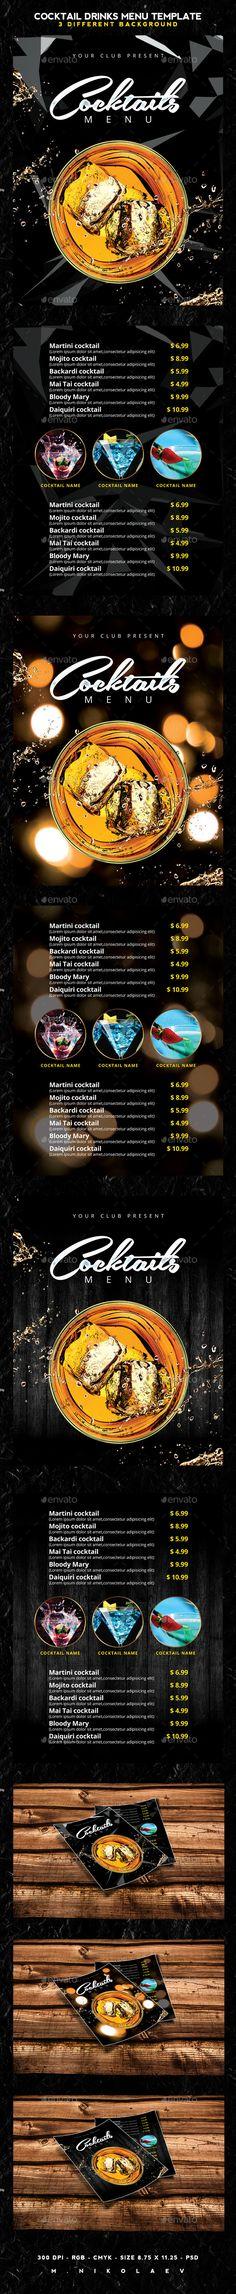 wine card, menu card, drinks Wine Design Pinterest Menu - cocktail menu template free download